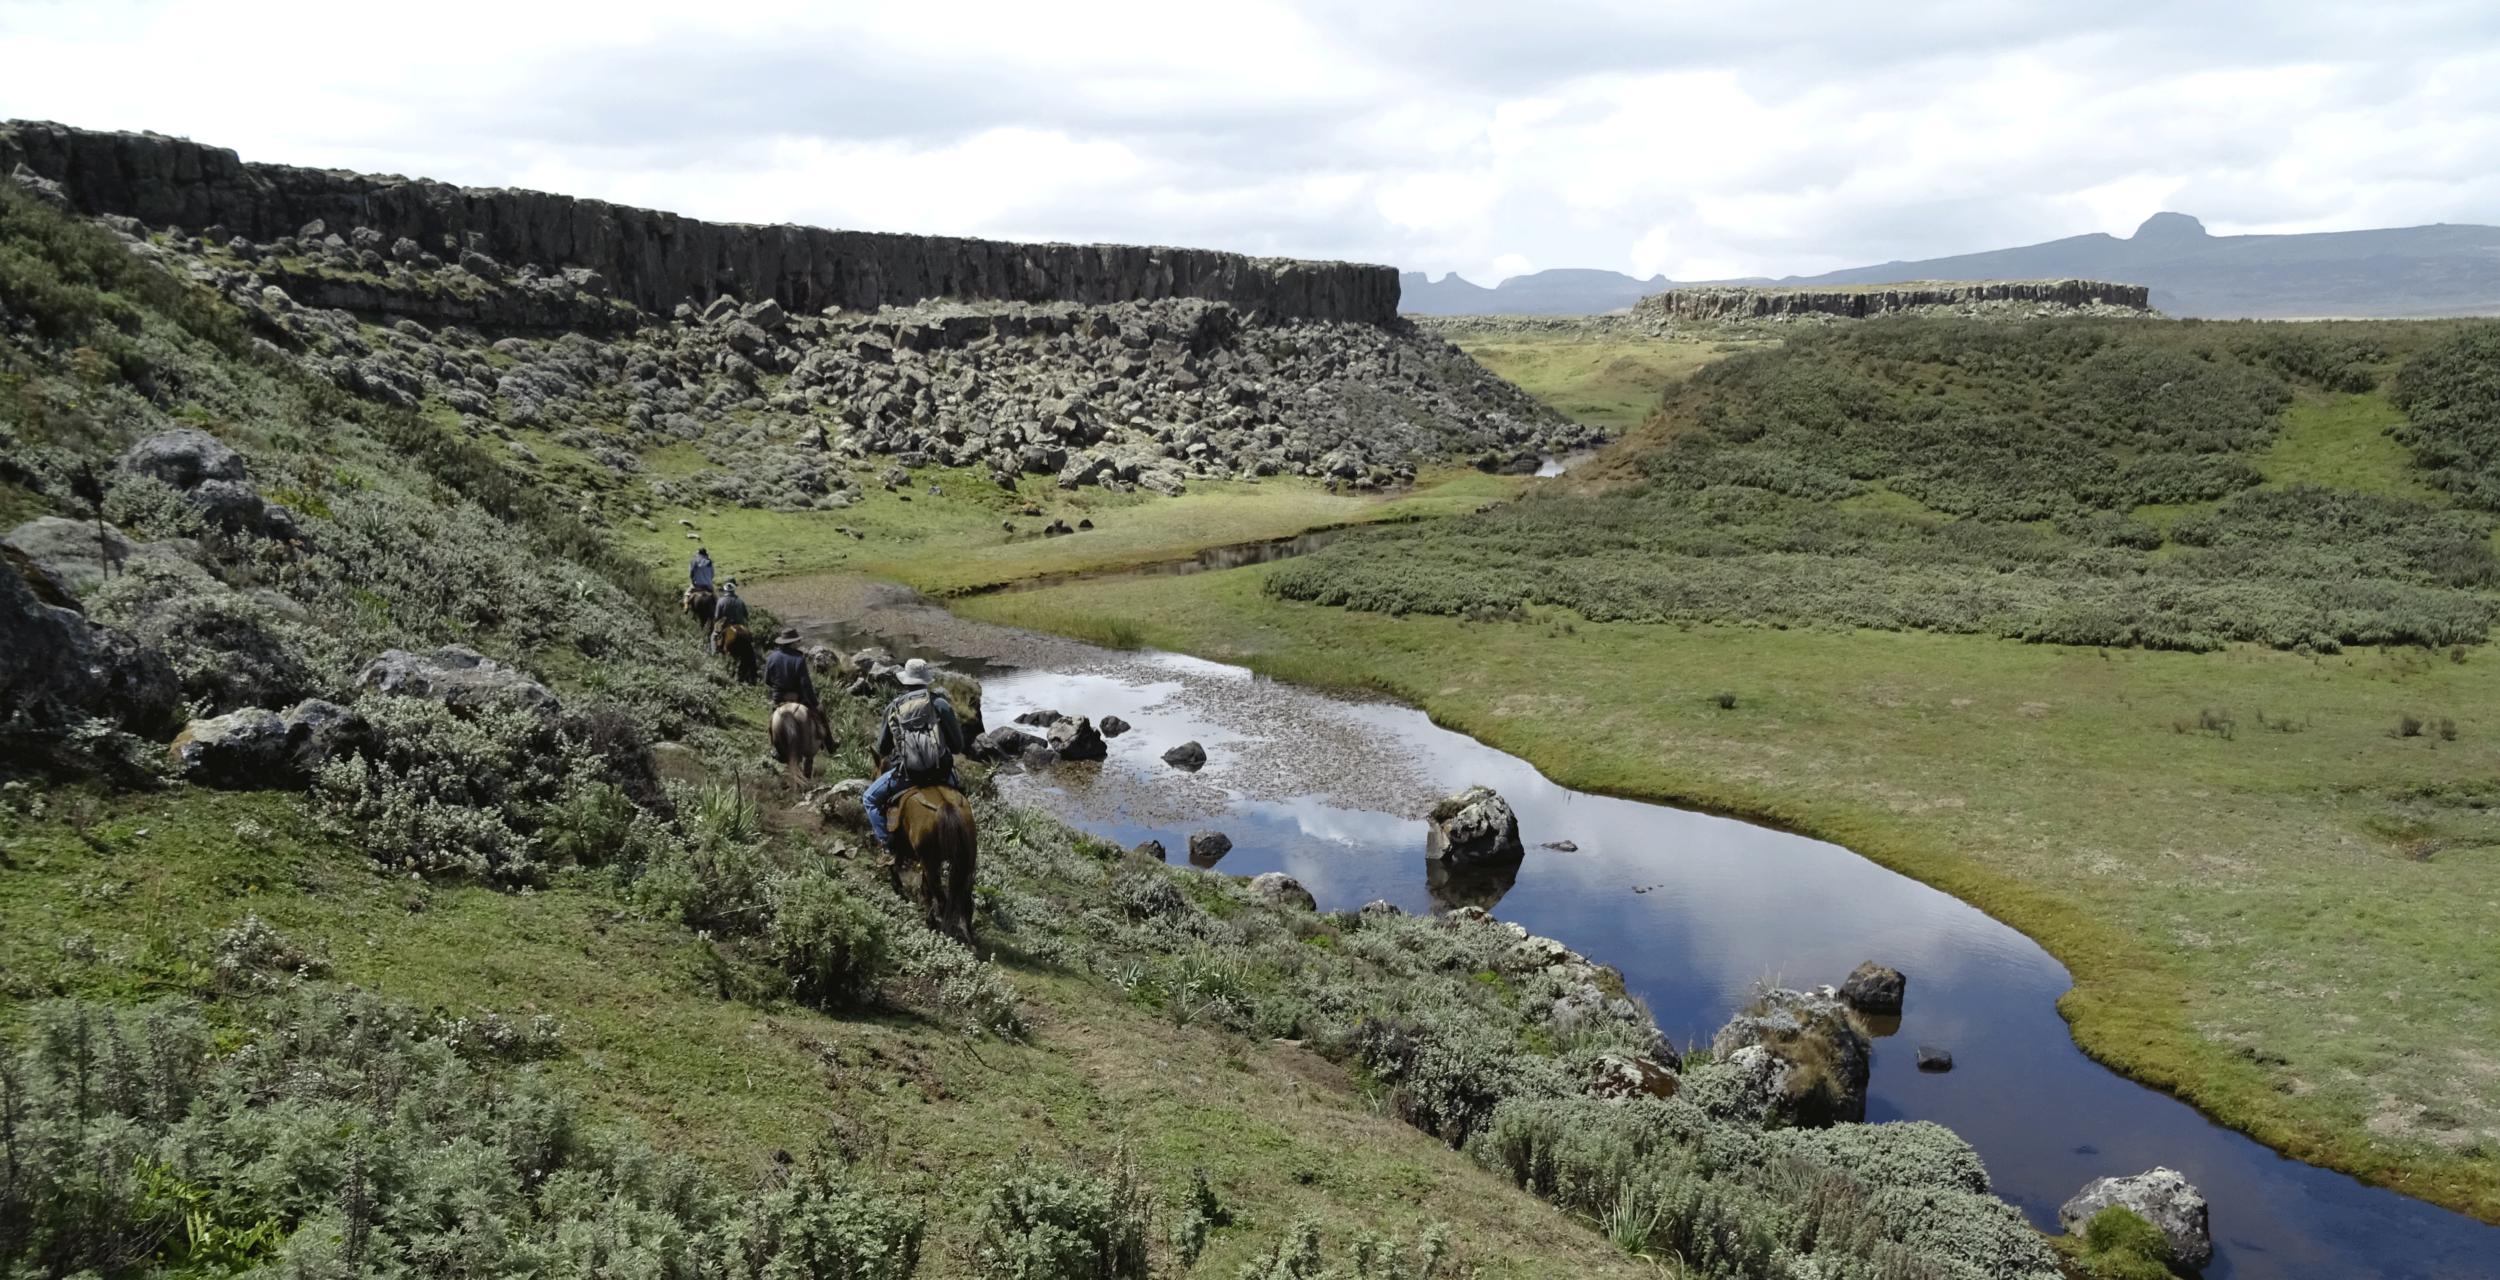 Horseback-Ethiopia-Bale-Mountains.png